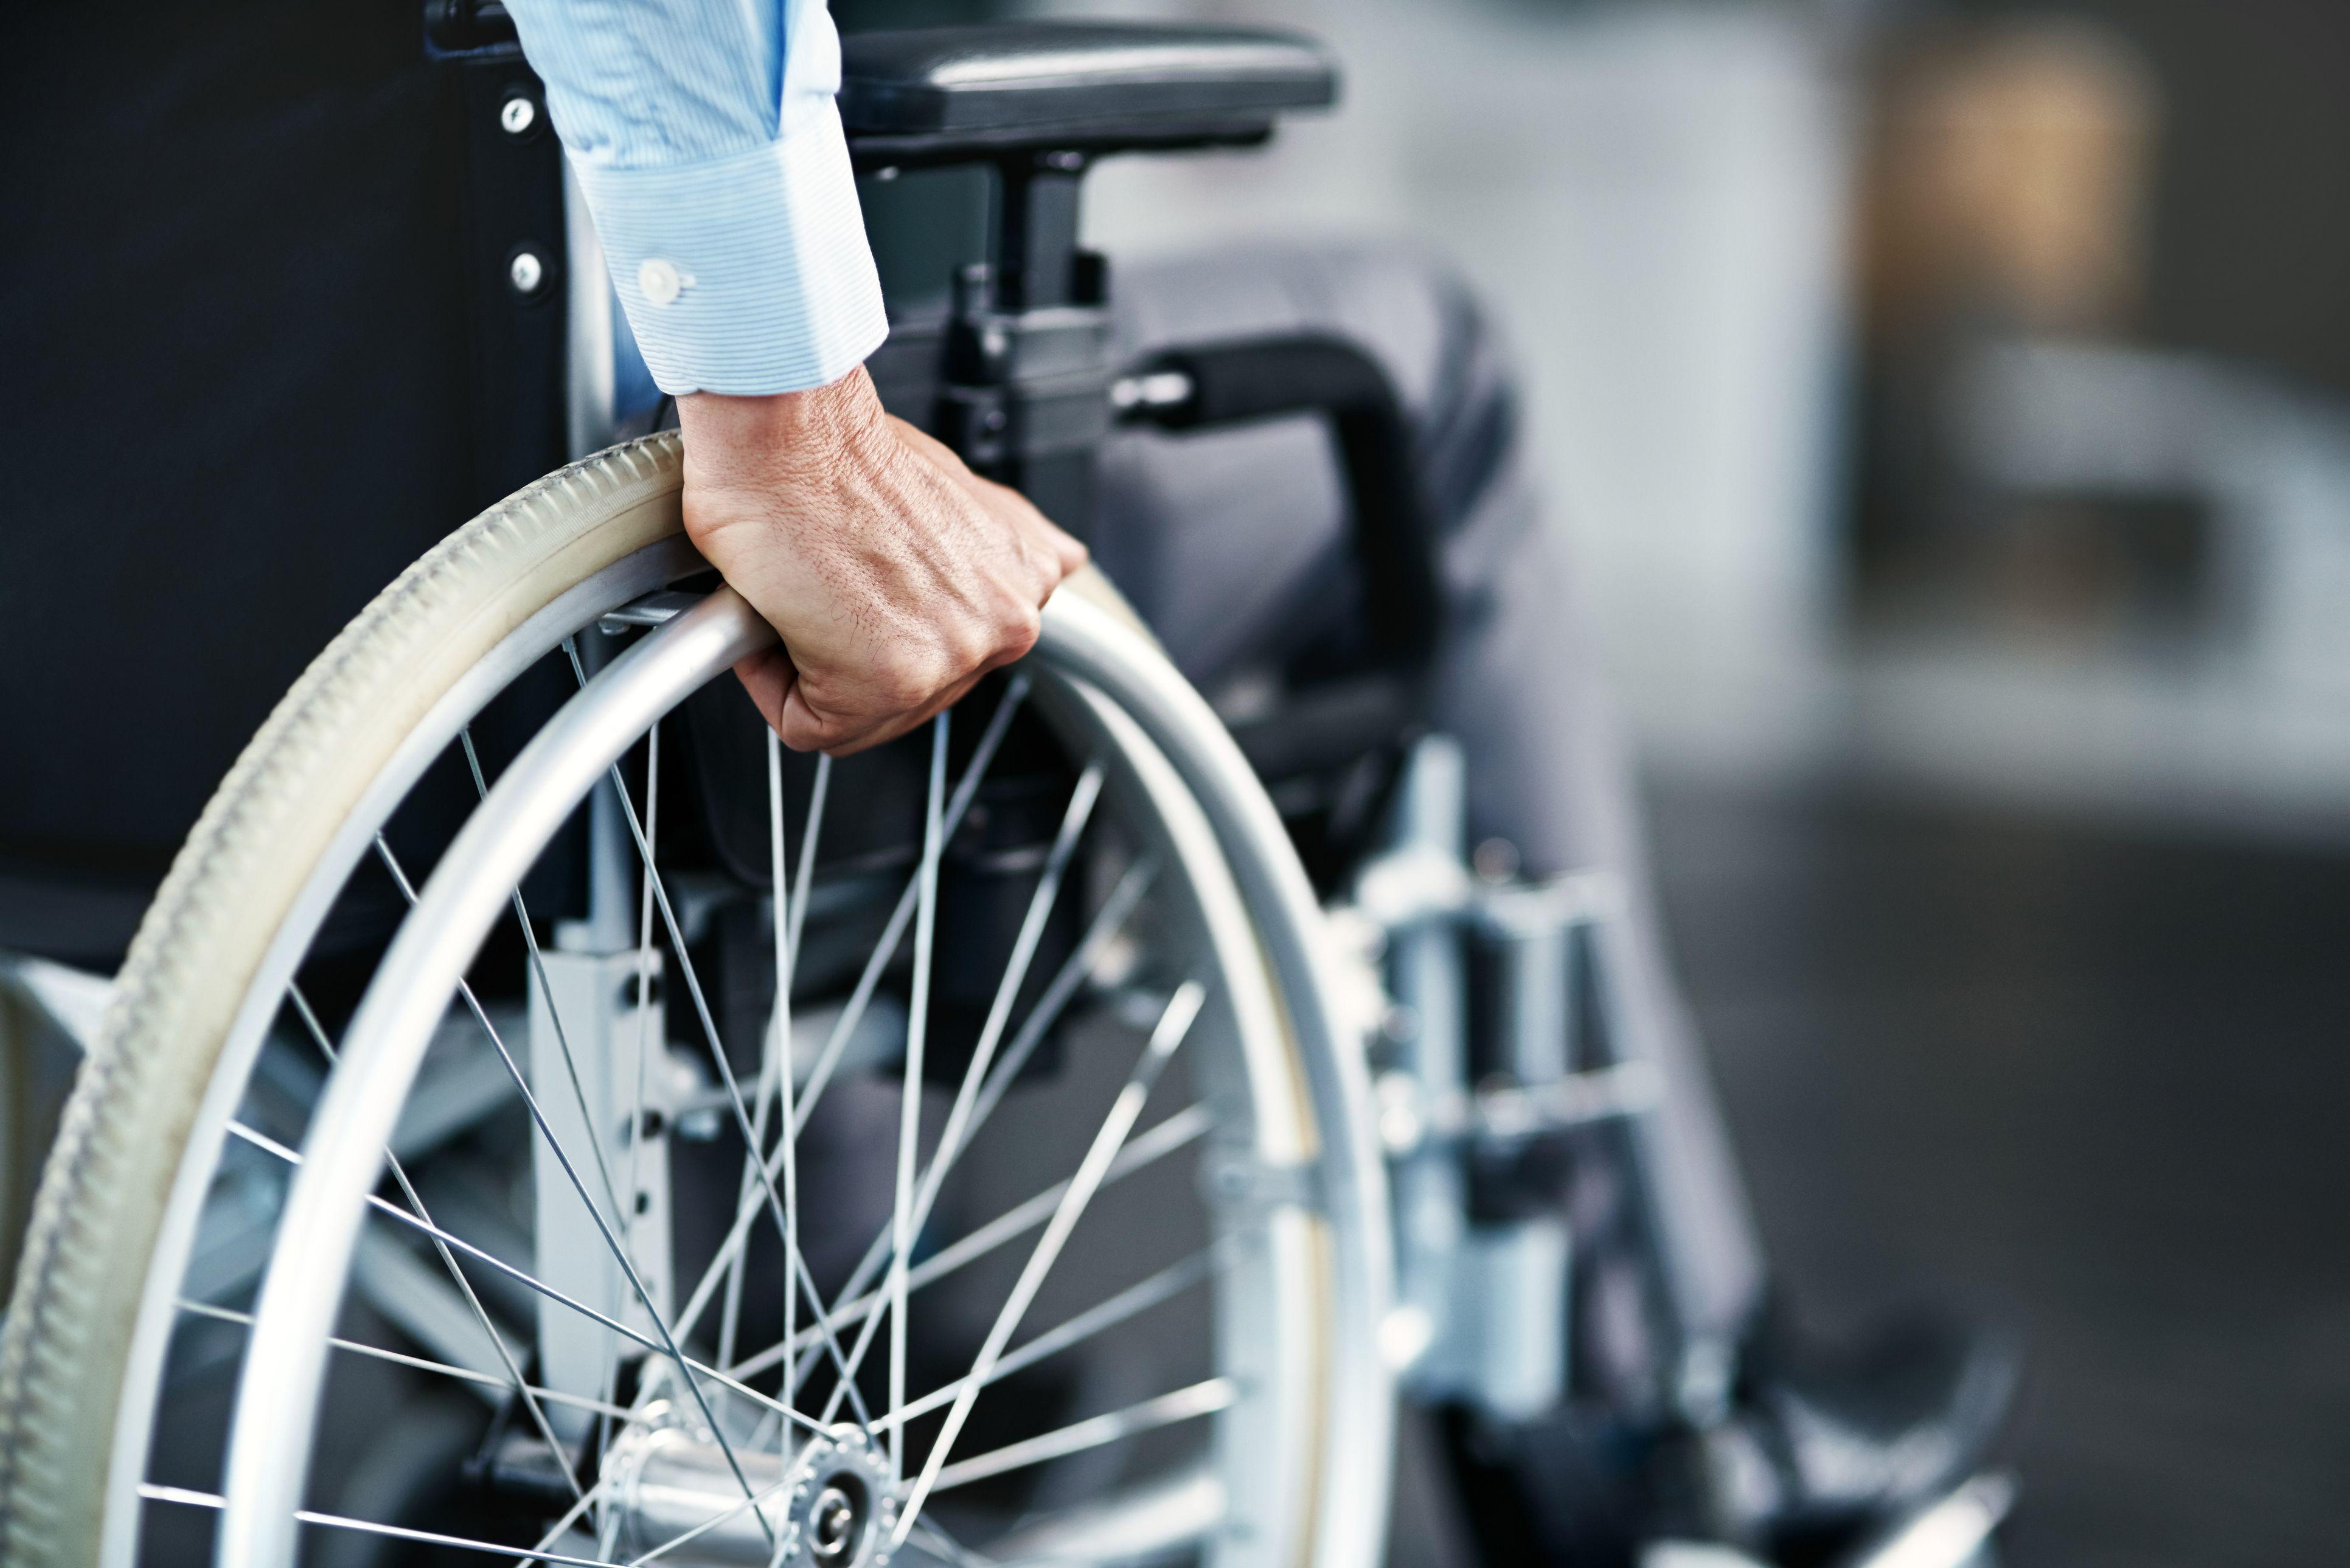 Alquiler de sillas de ruedas en Calafell